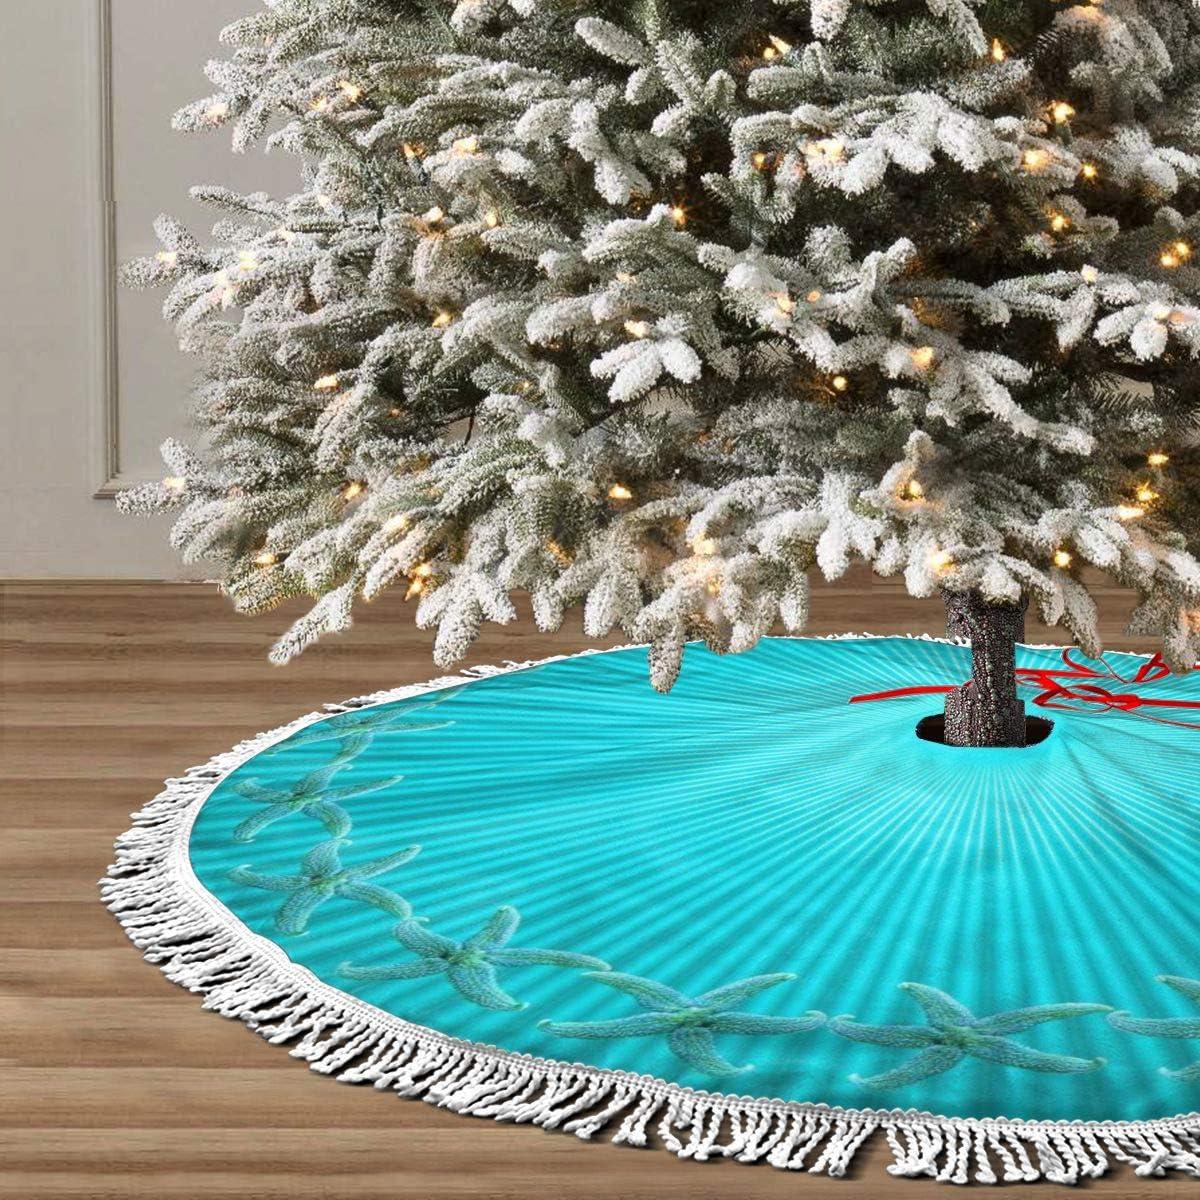 30 Inch 1950S Cartoon Christmas Tree Skirt Tree Skirt Ornaments with Tassel Edges Tassel Edges